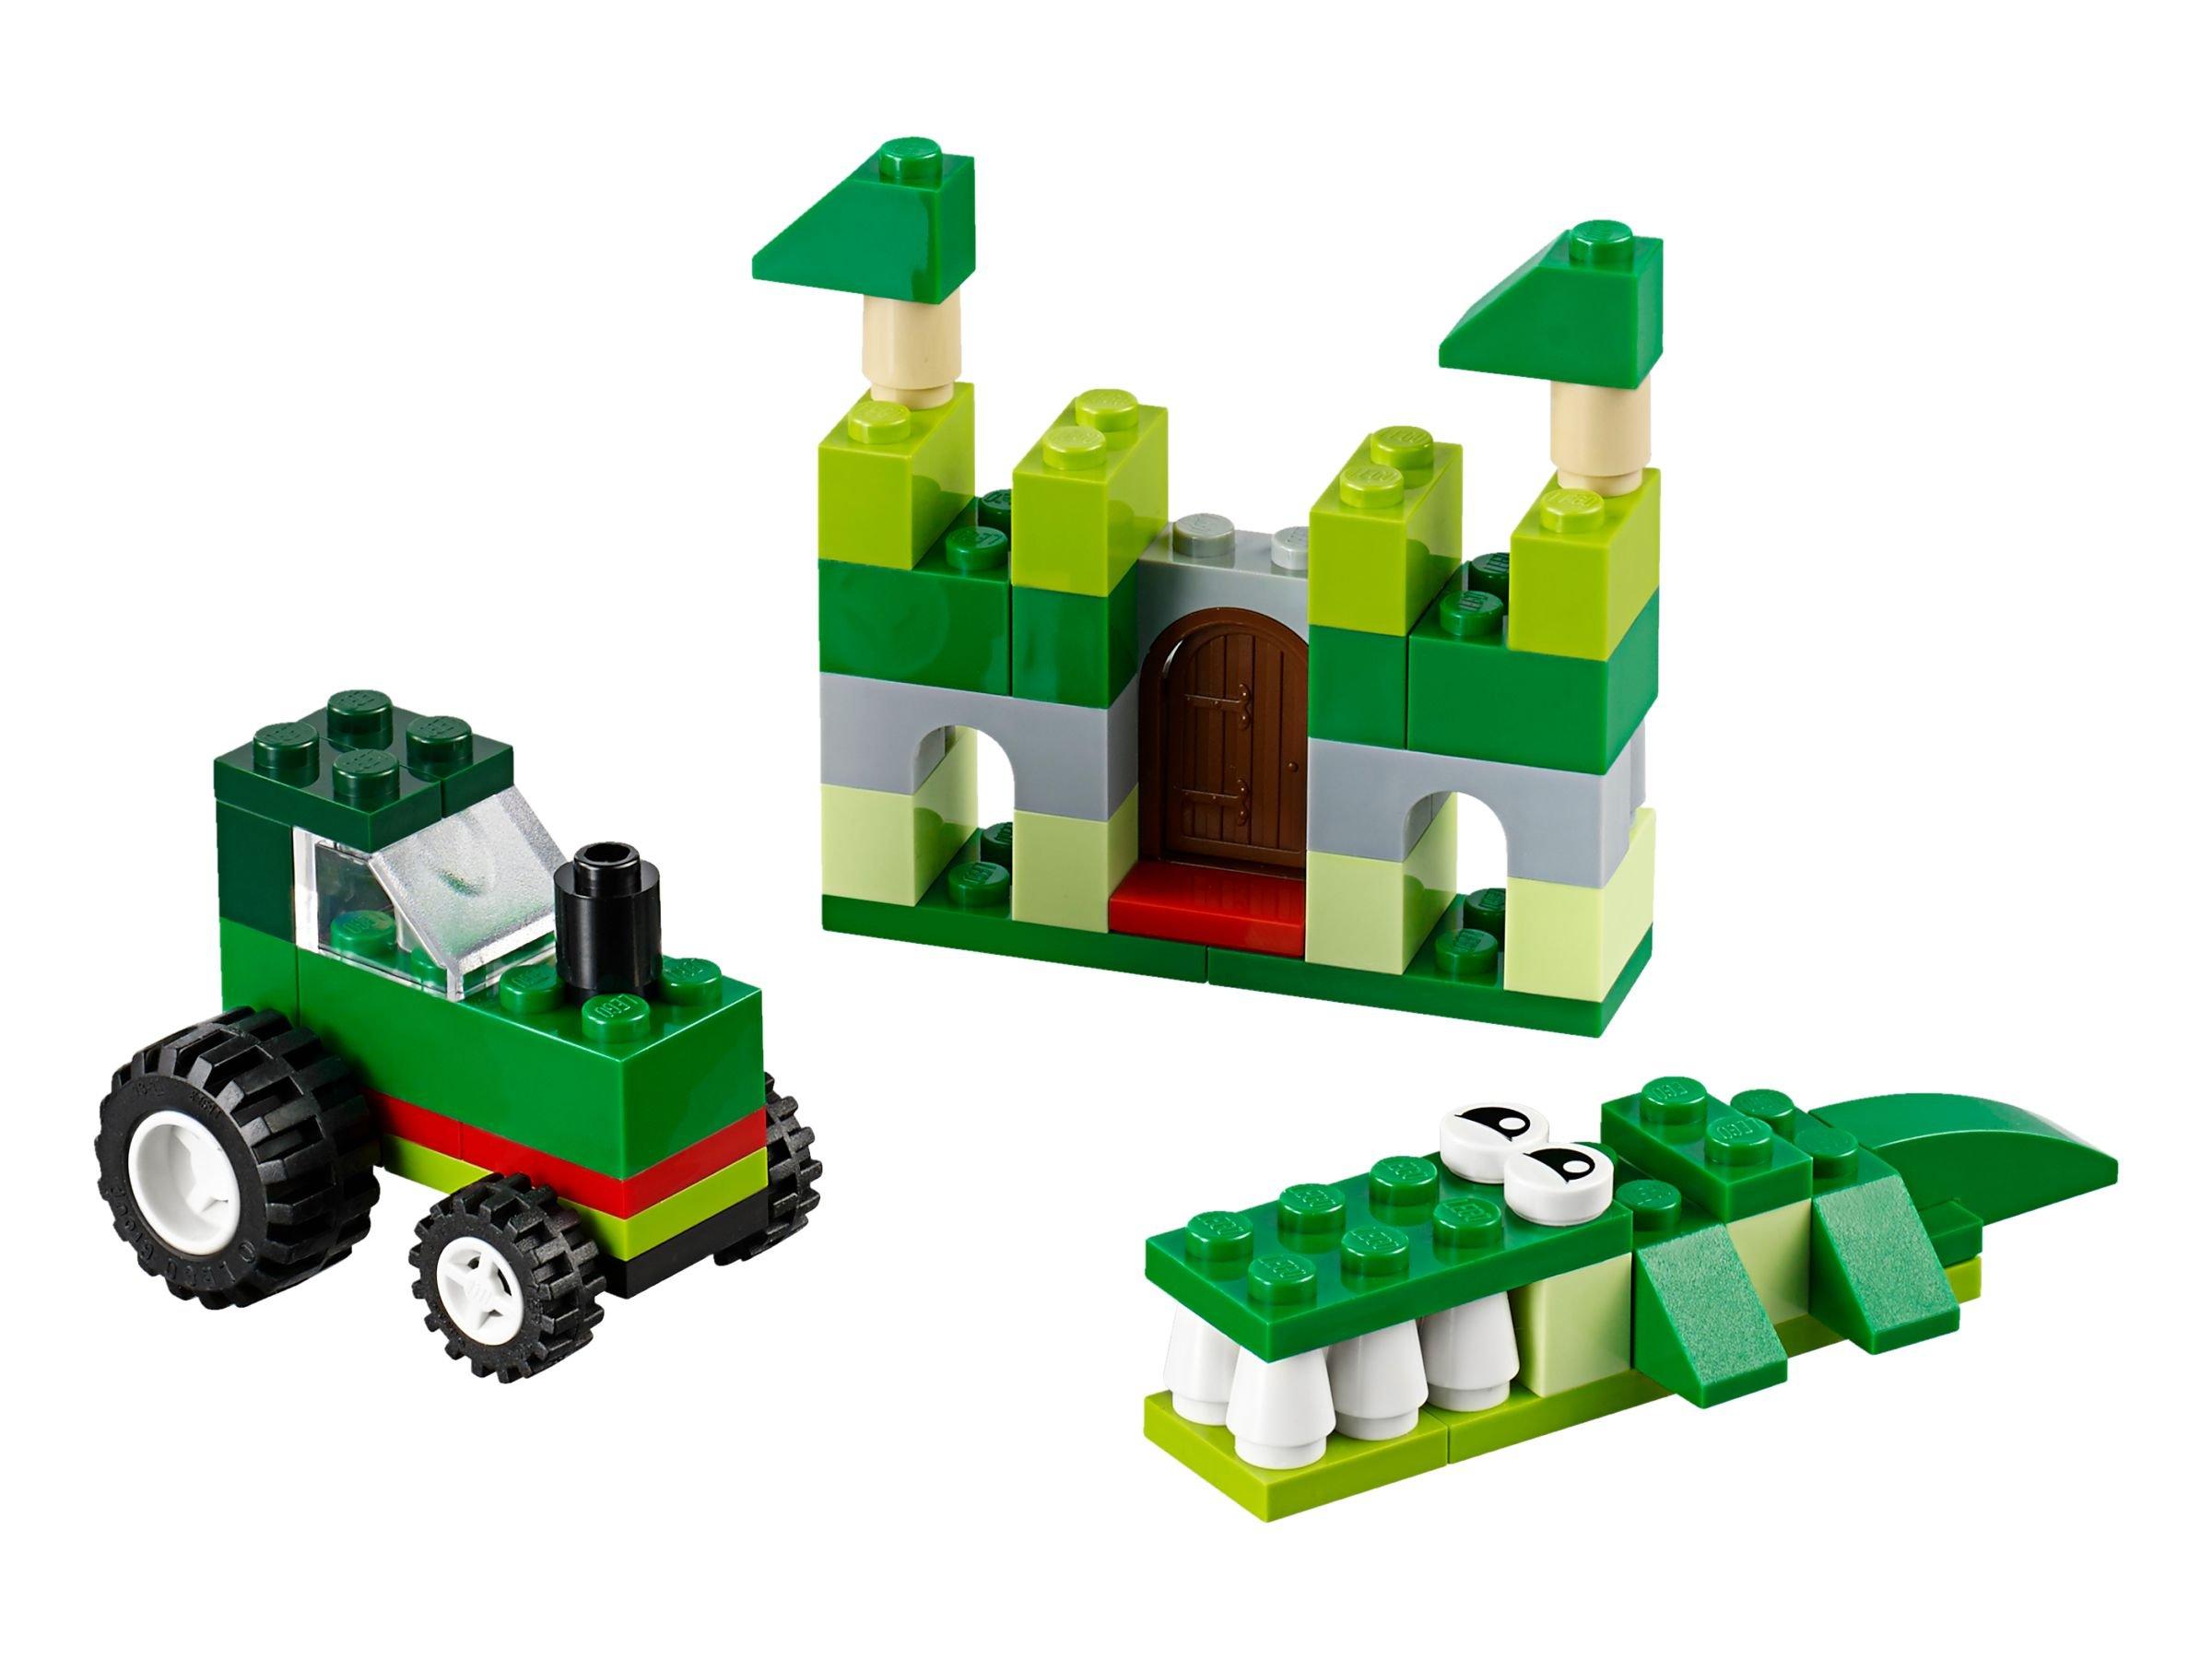 lego 10708 kreativ box gr n classic 2017 ab 3 49 30 gespart green creative box. Black Bedroom Furniture Sets. Home Design Ideas